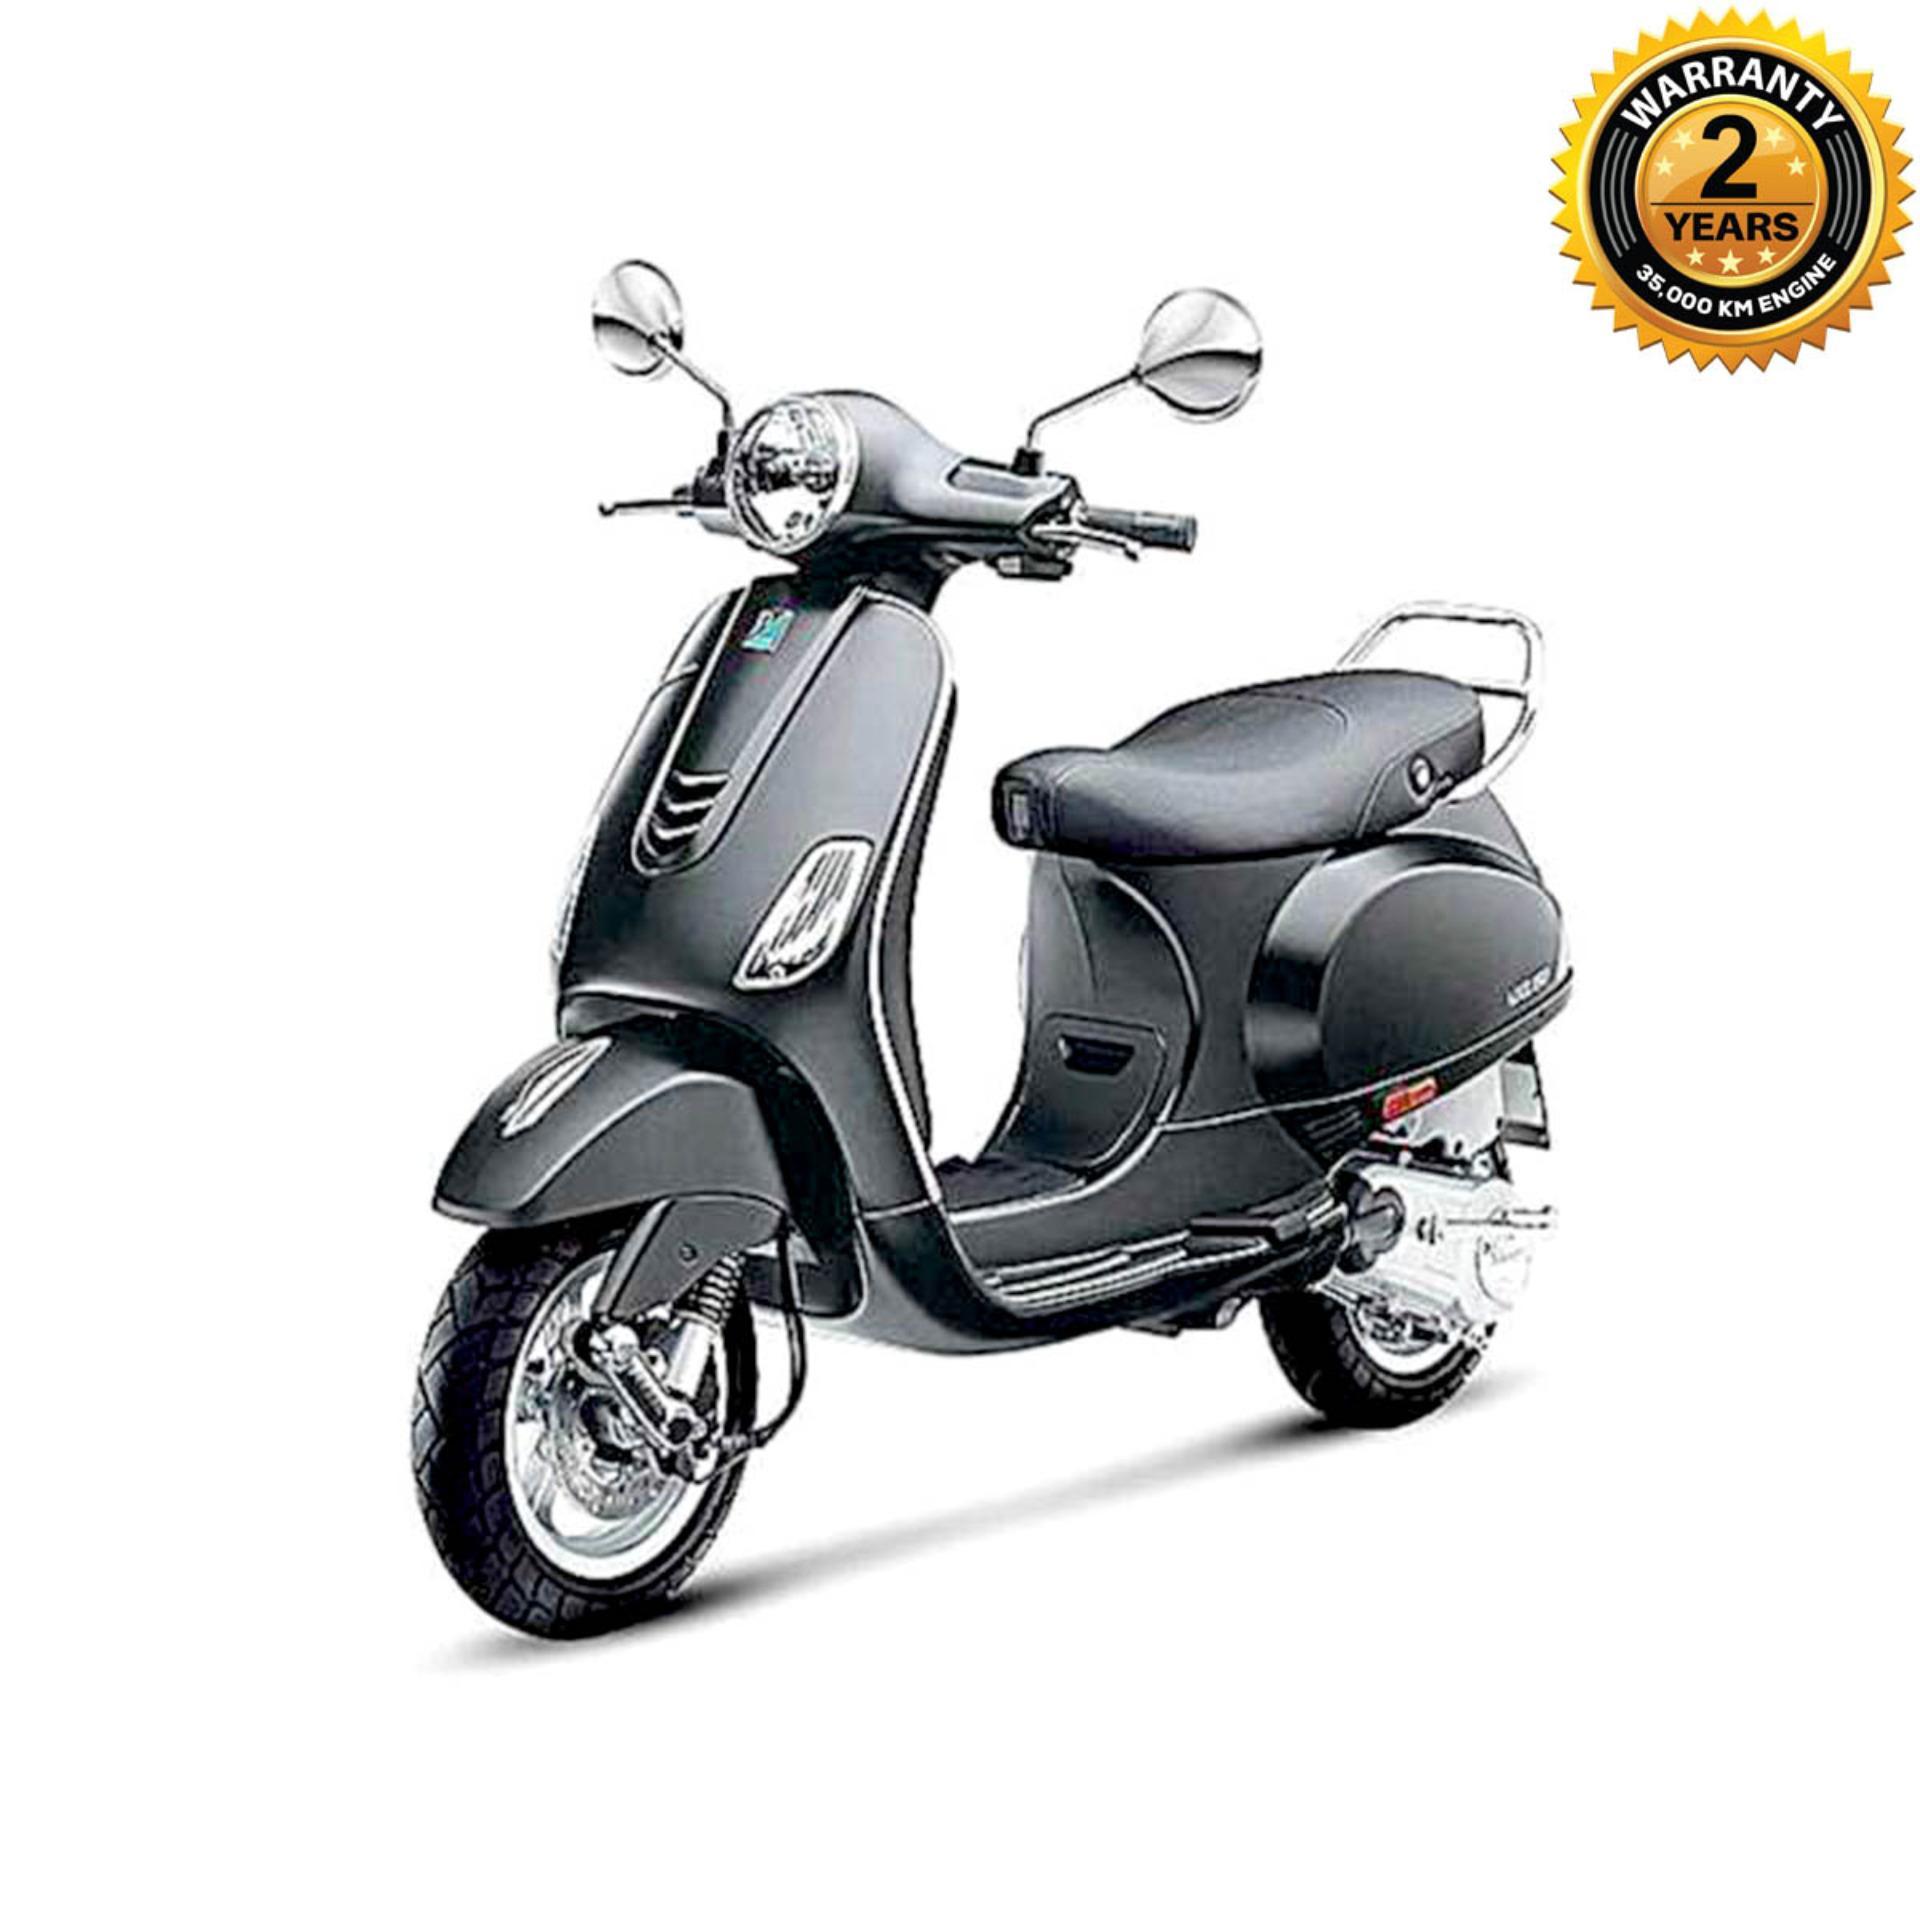 VXL150 150cc Scooter - Matte Black